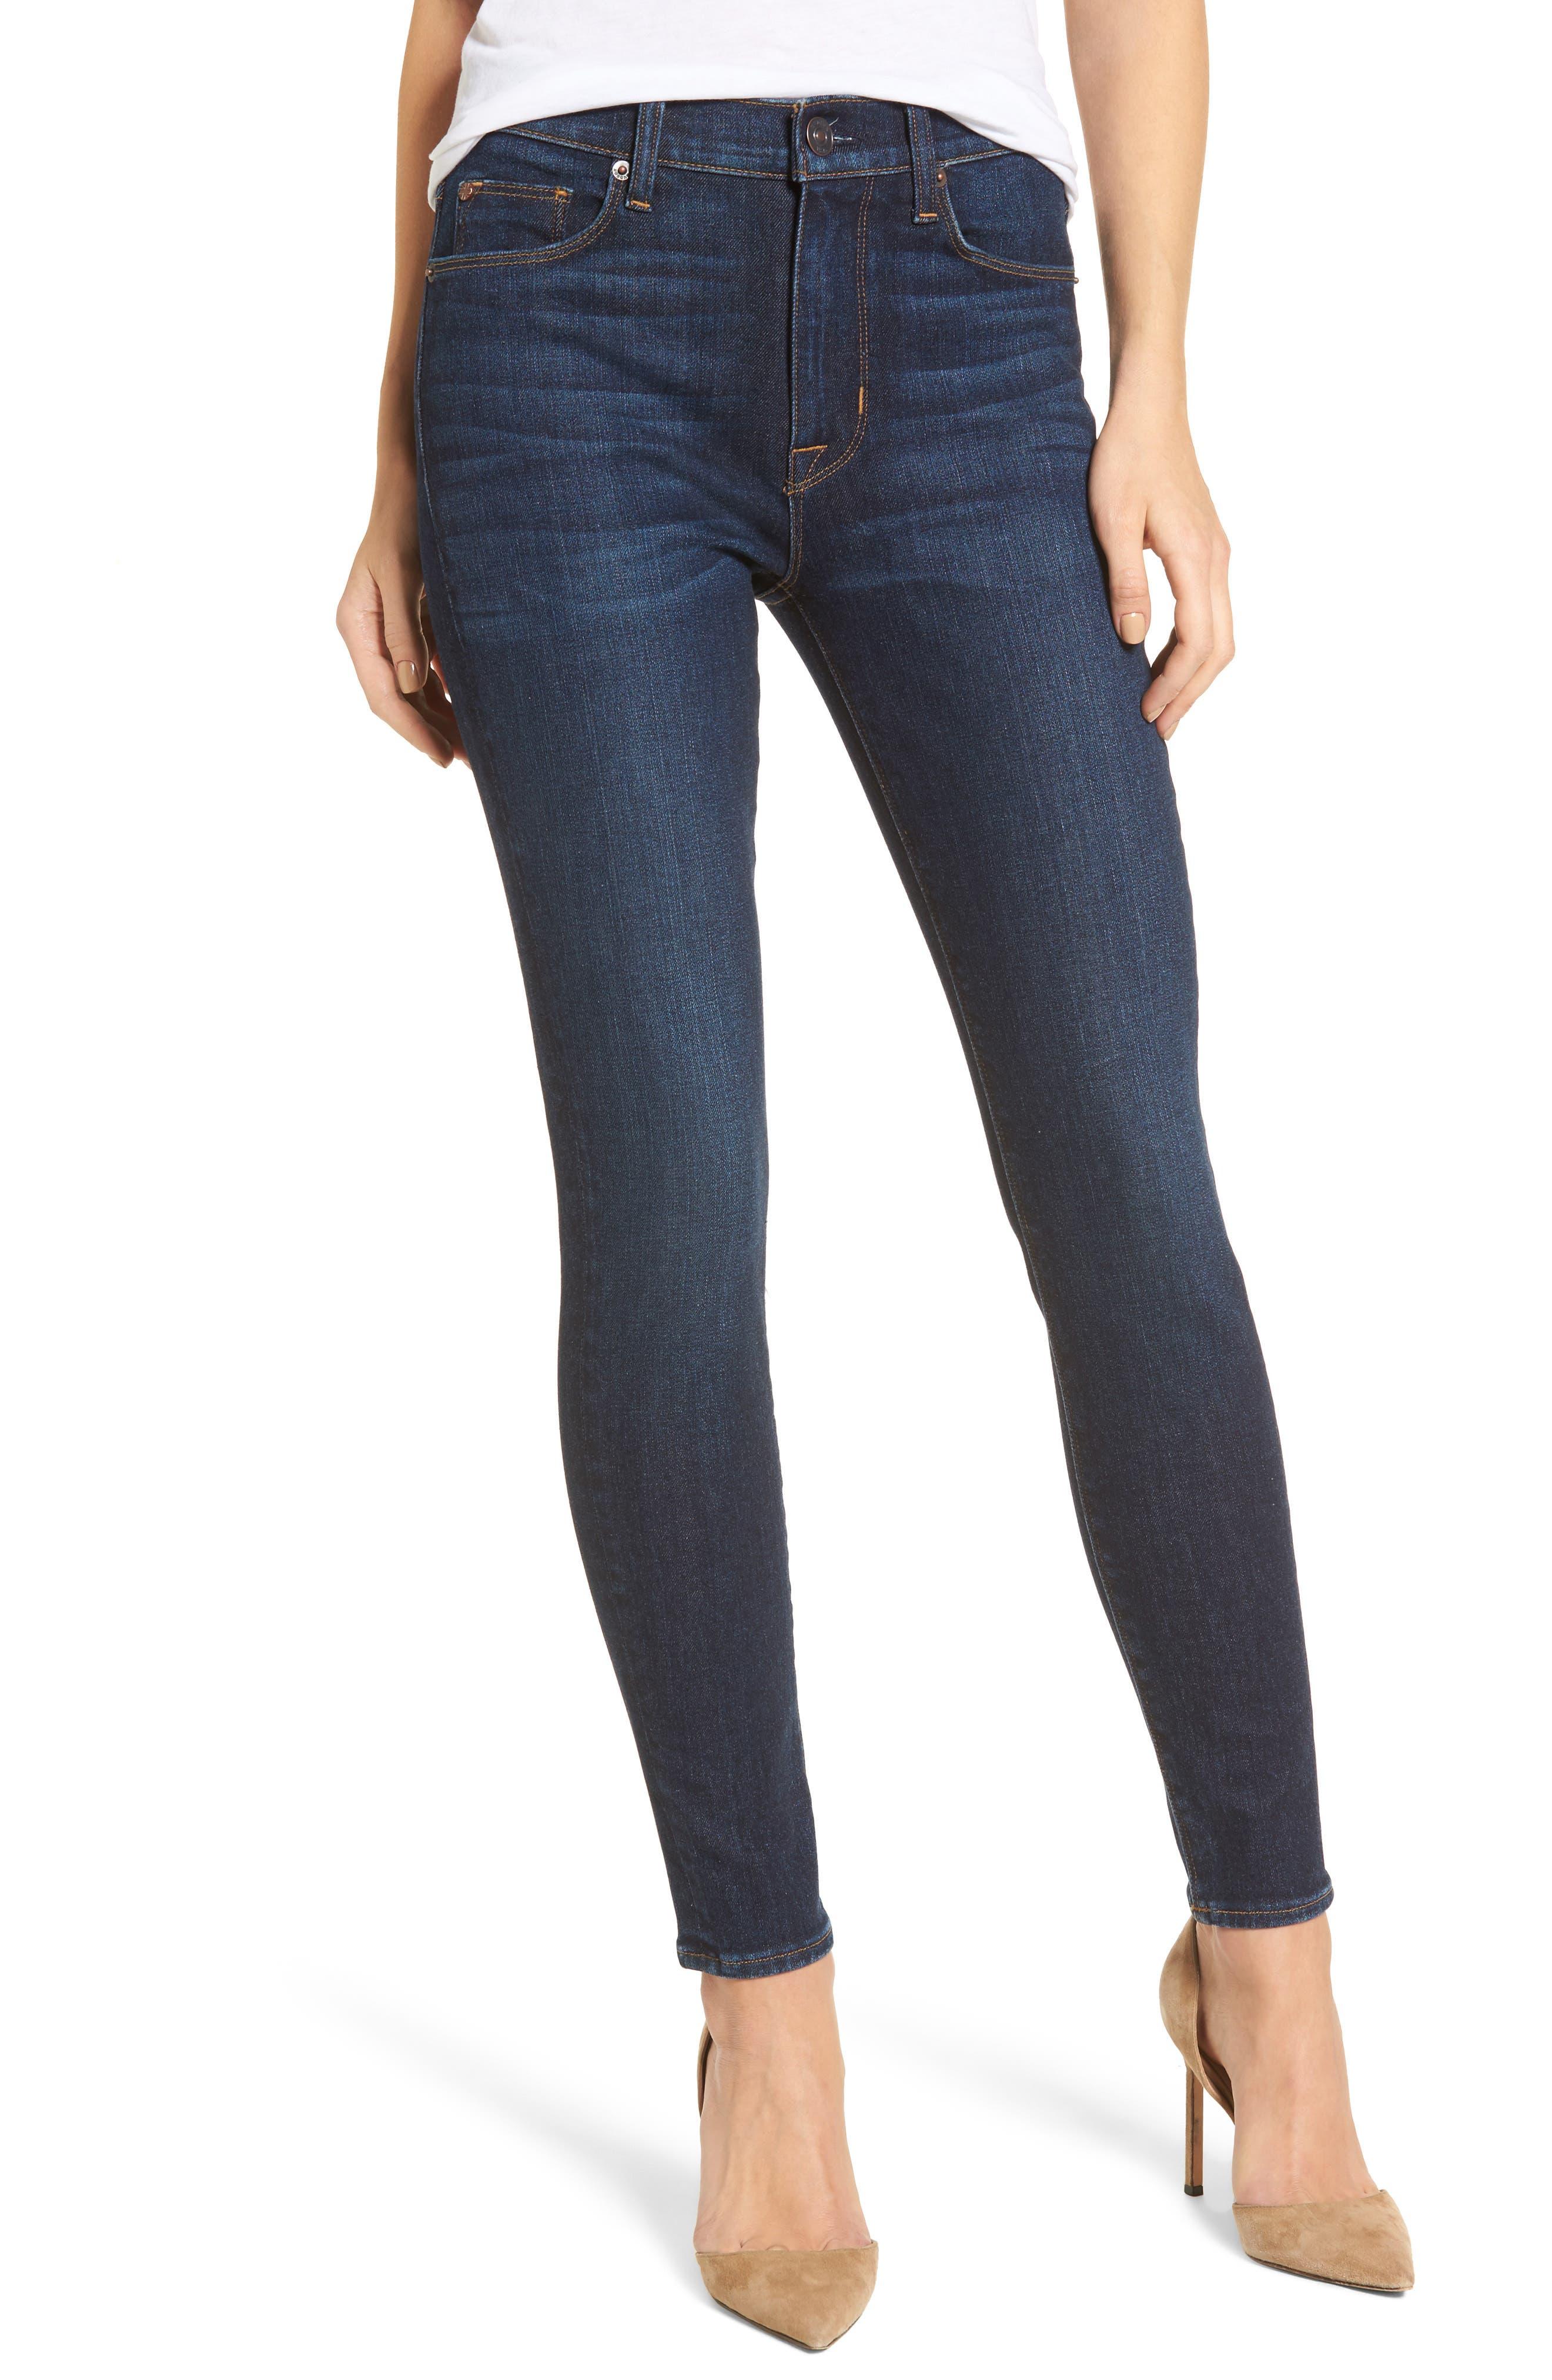 Barbara High Waist Ankle Super Skinny Jeans,                             Main thumbnail 1, color,                             Daze